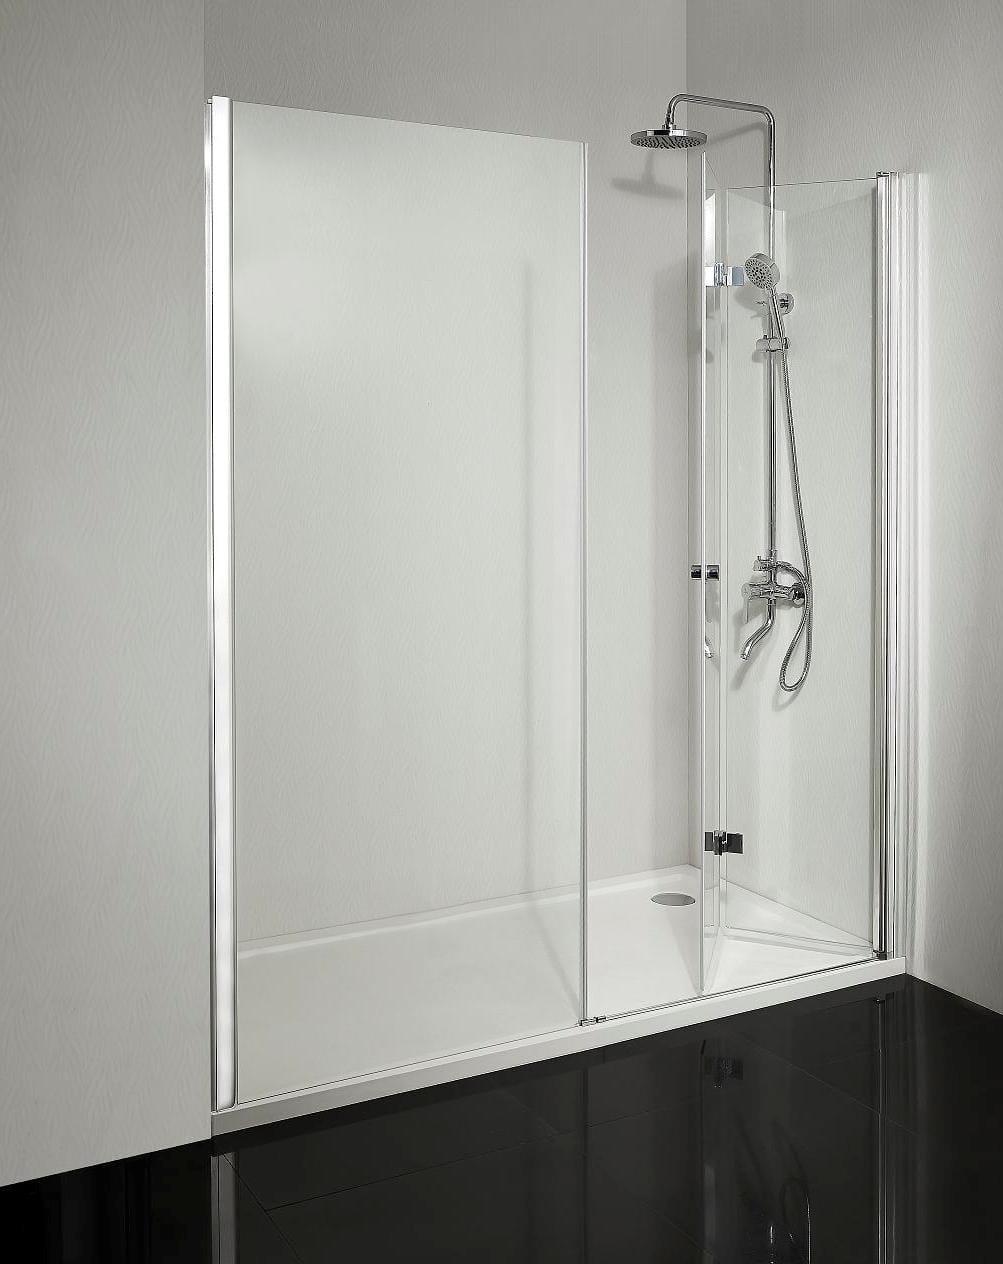 Sanotechnik - SMARTFLEX - Sprchové dvere do výklenku, sklopné, pravé 220 x 195 cm